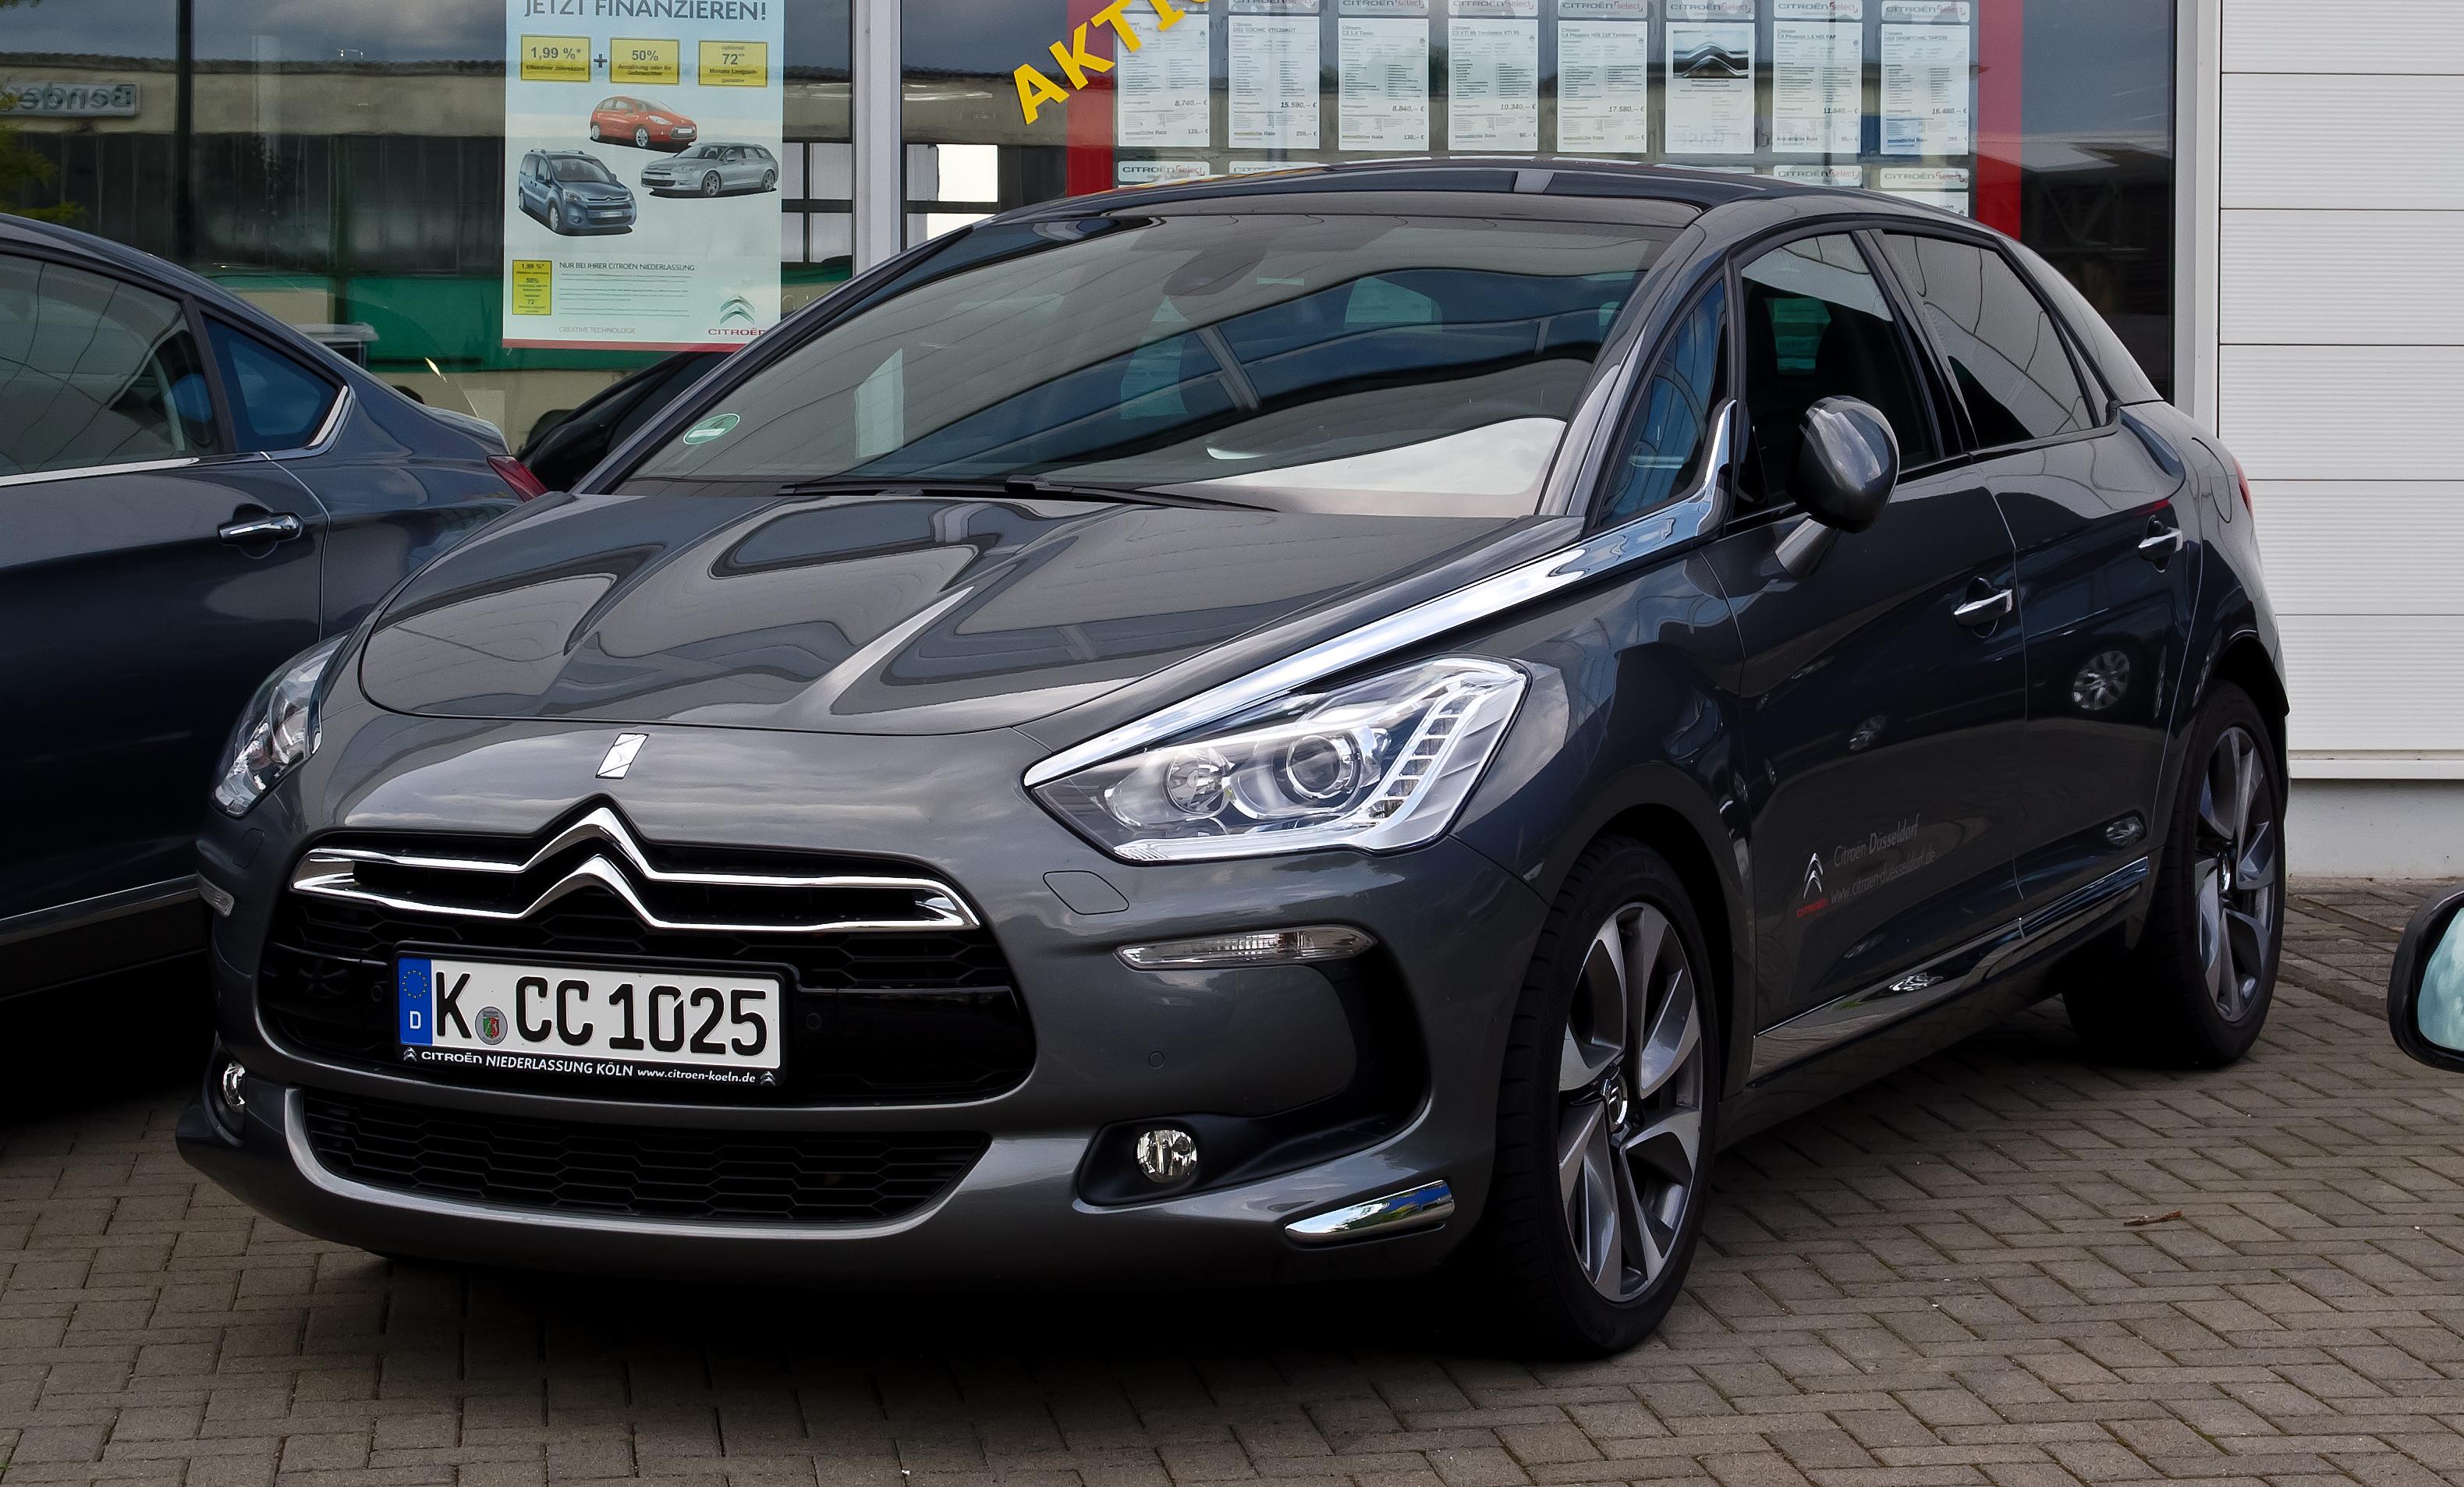 File:Citroën DS5 THP 200 SportChic – Frontansicht, 19  Mai 2012